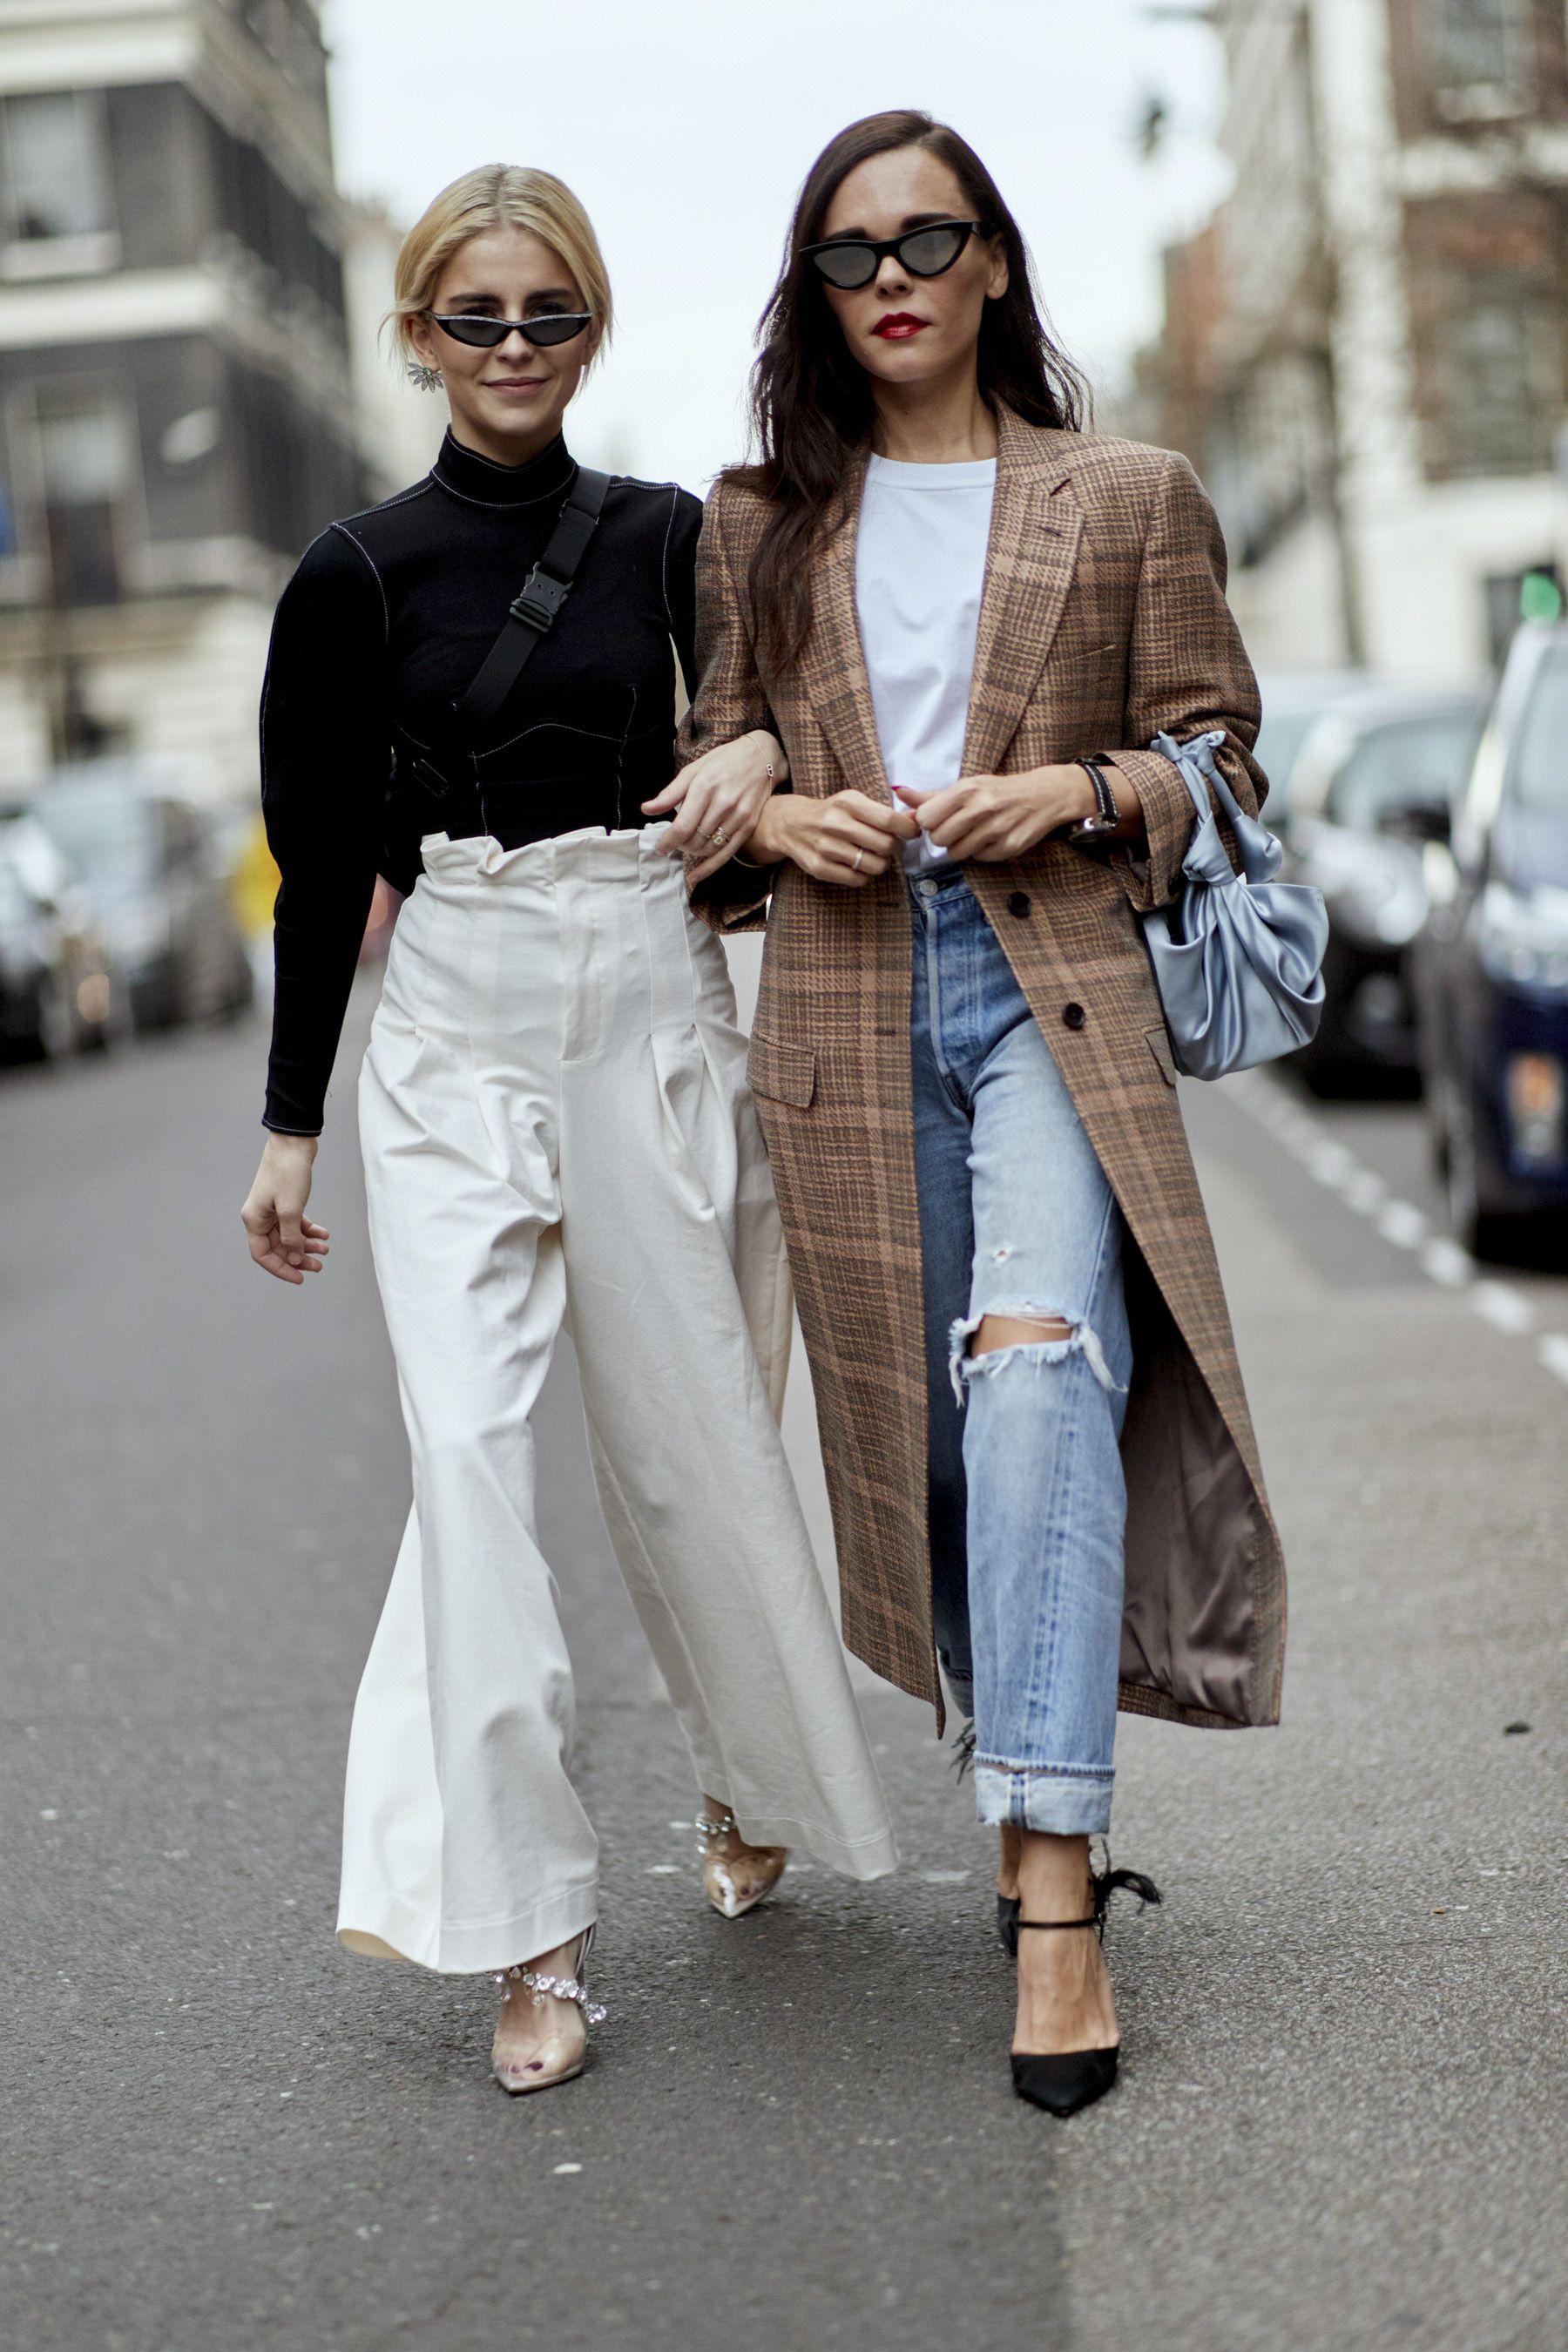 London Fashion: London Fashion Week Street Style Fall 2018 Day 3 Cont